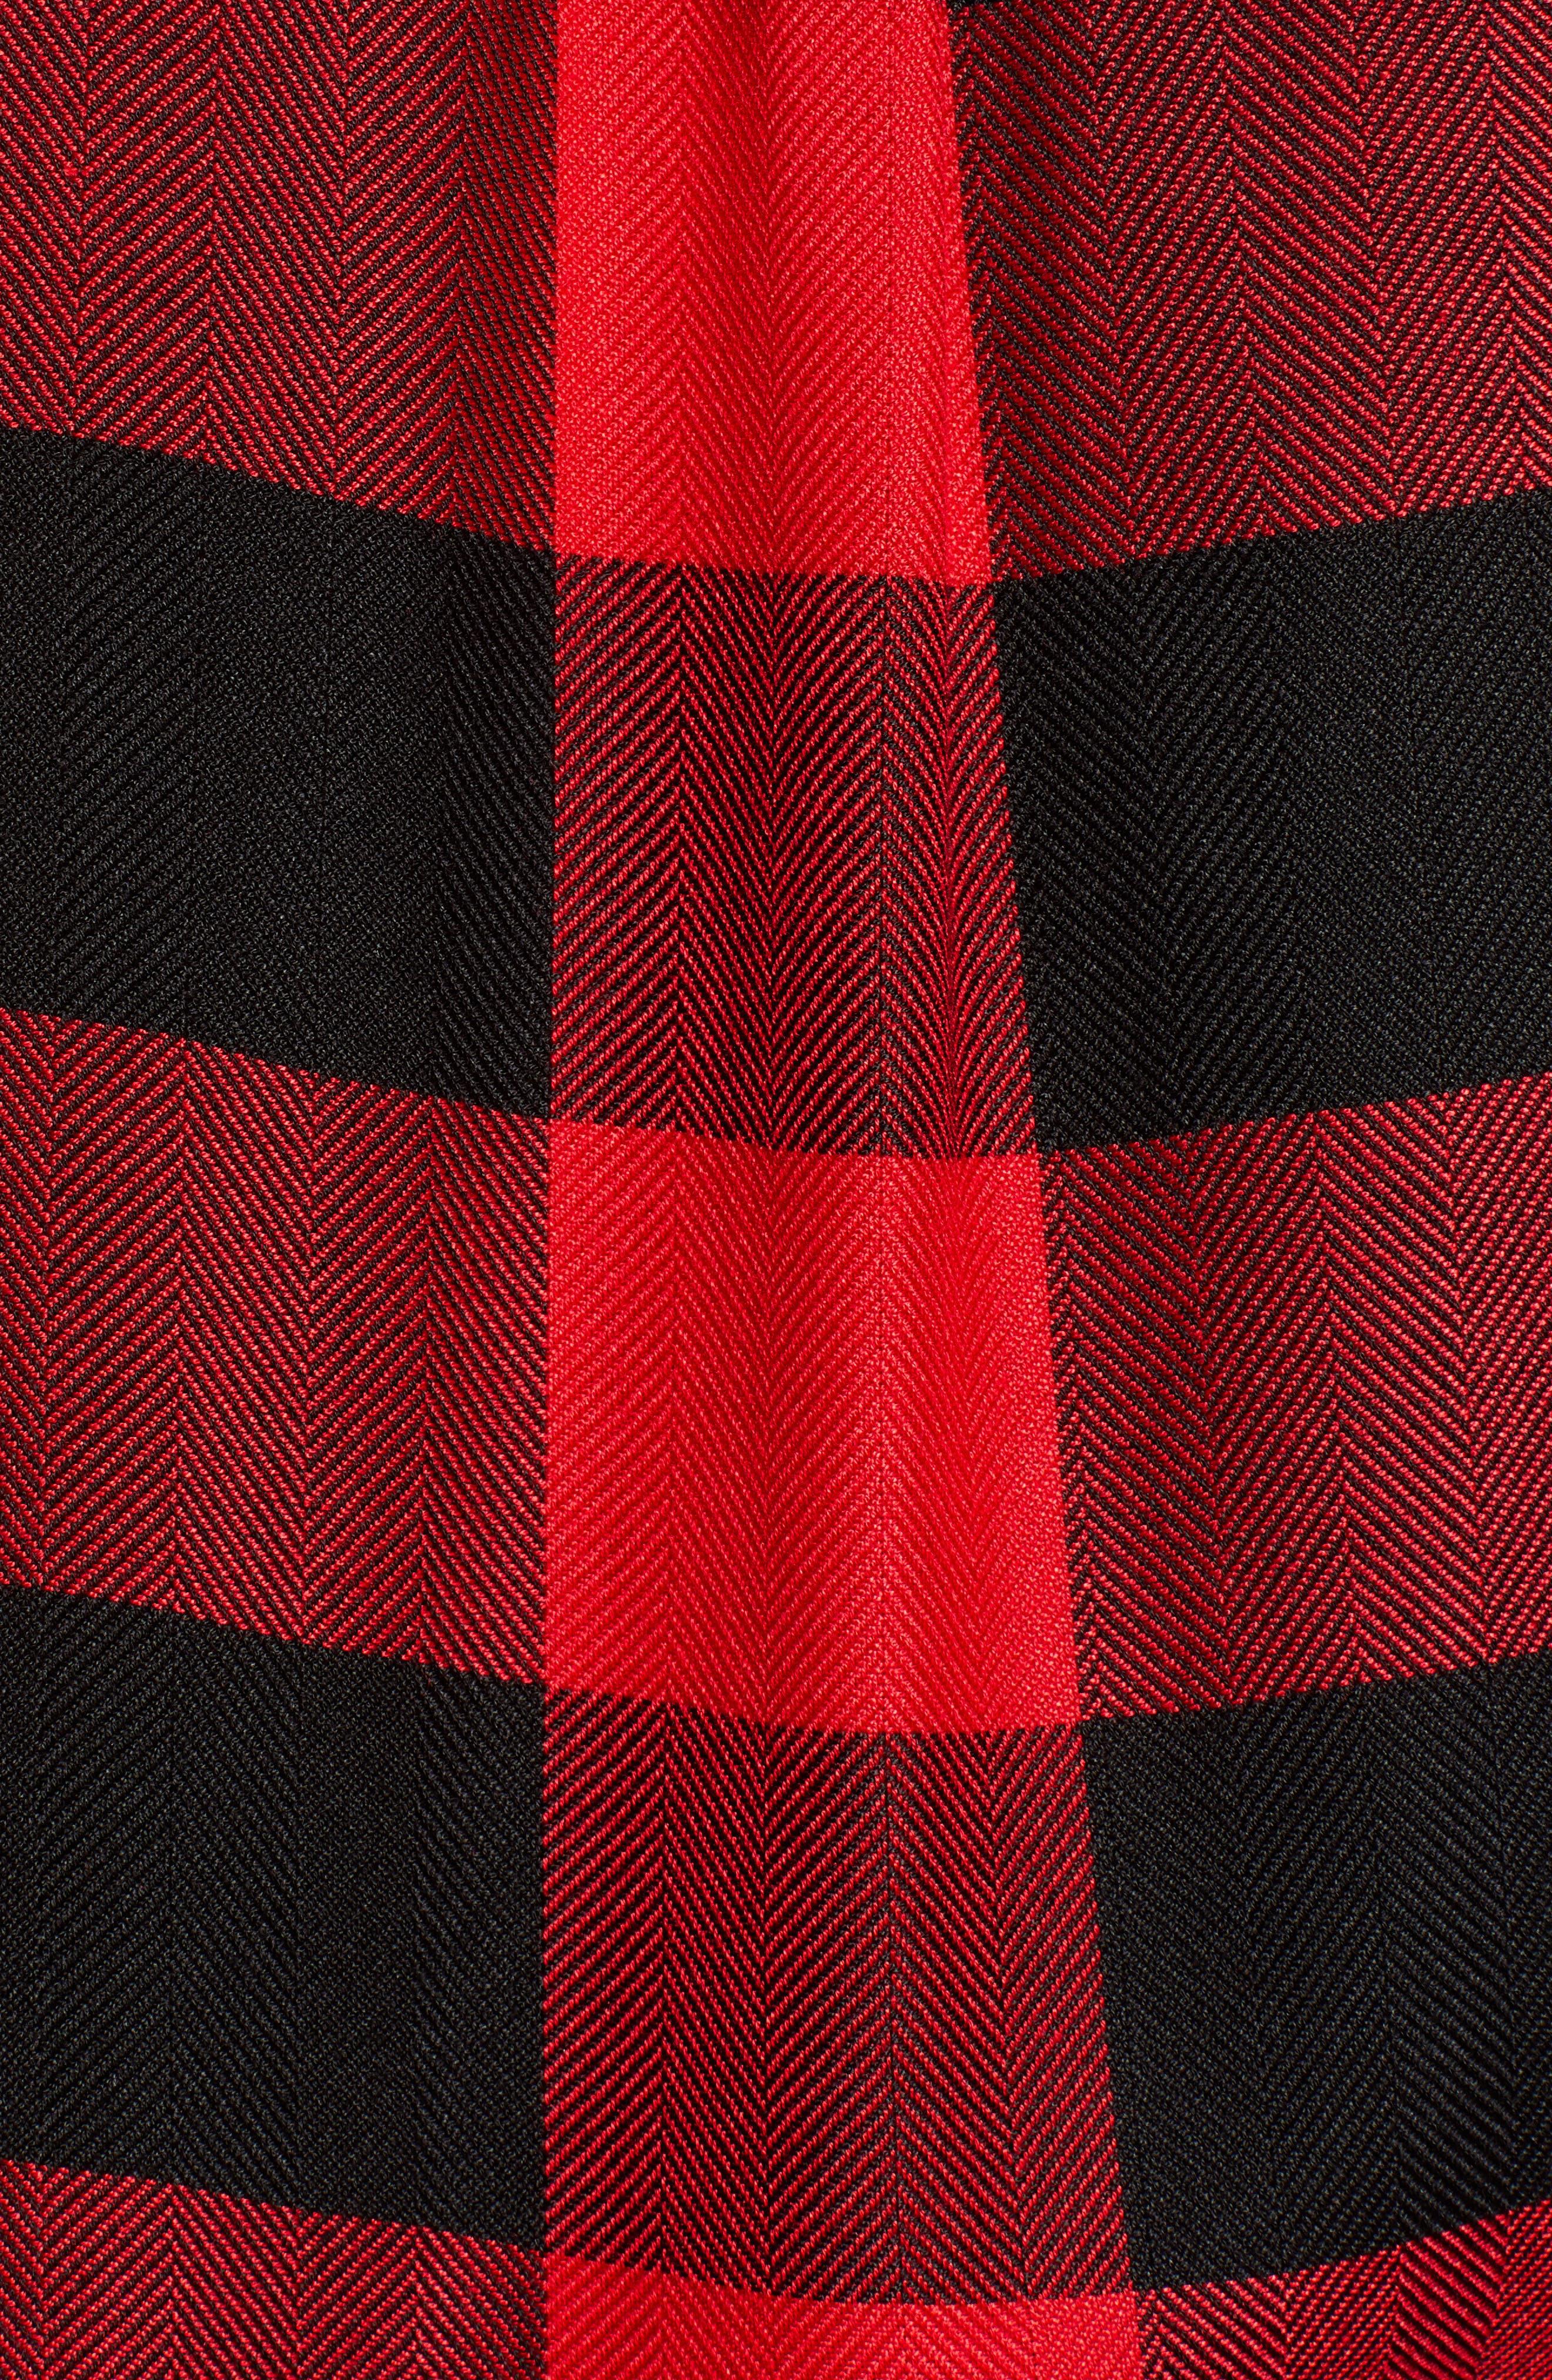 PAIGE,                             Elora Shirt,                             Alternate thumbnail 5, color,                             TRUE RED / BLACK